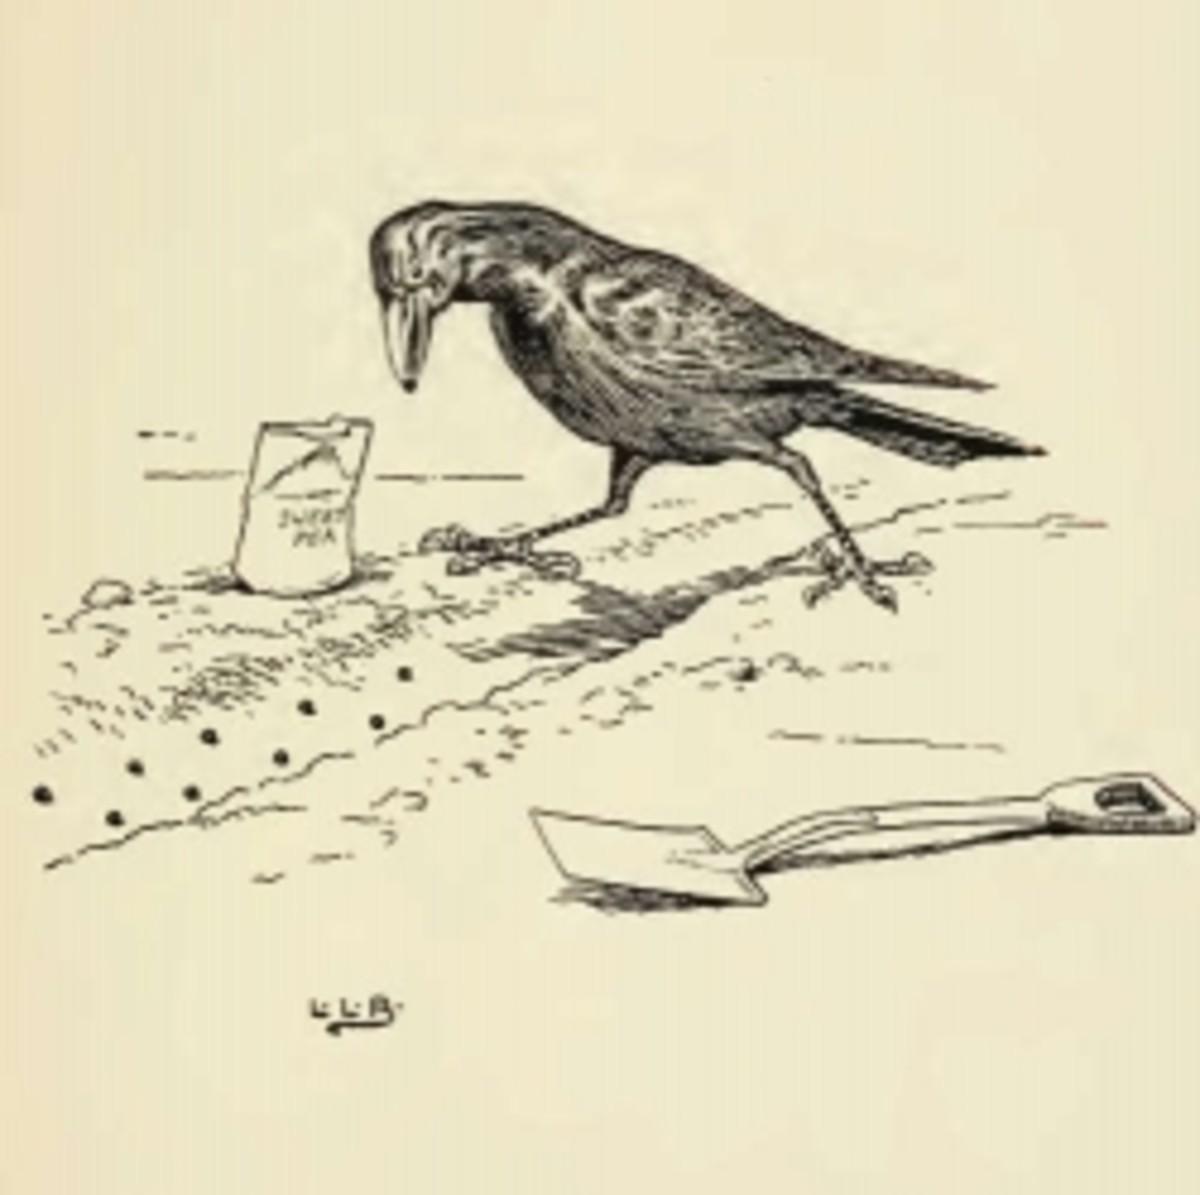 Johnny Crow by L Leslie Brooke